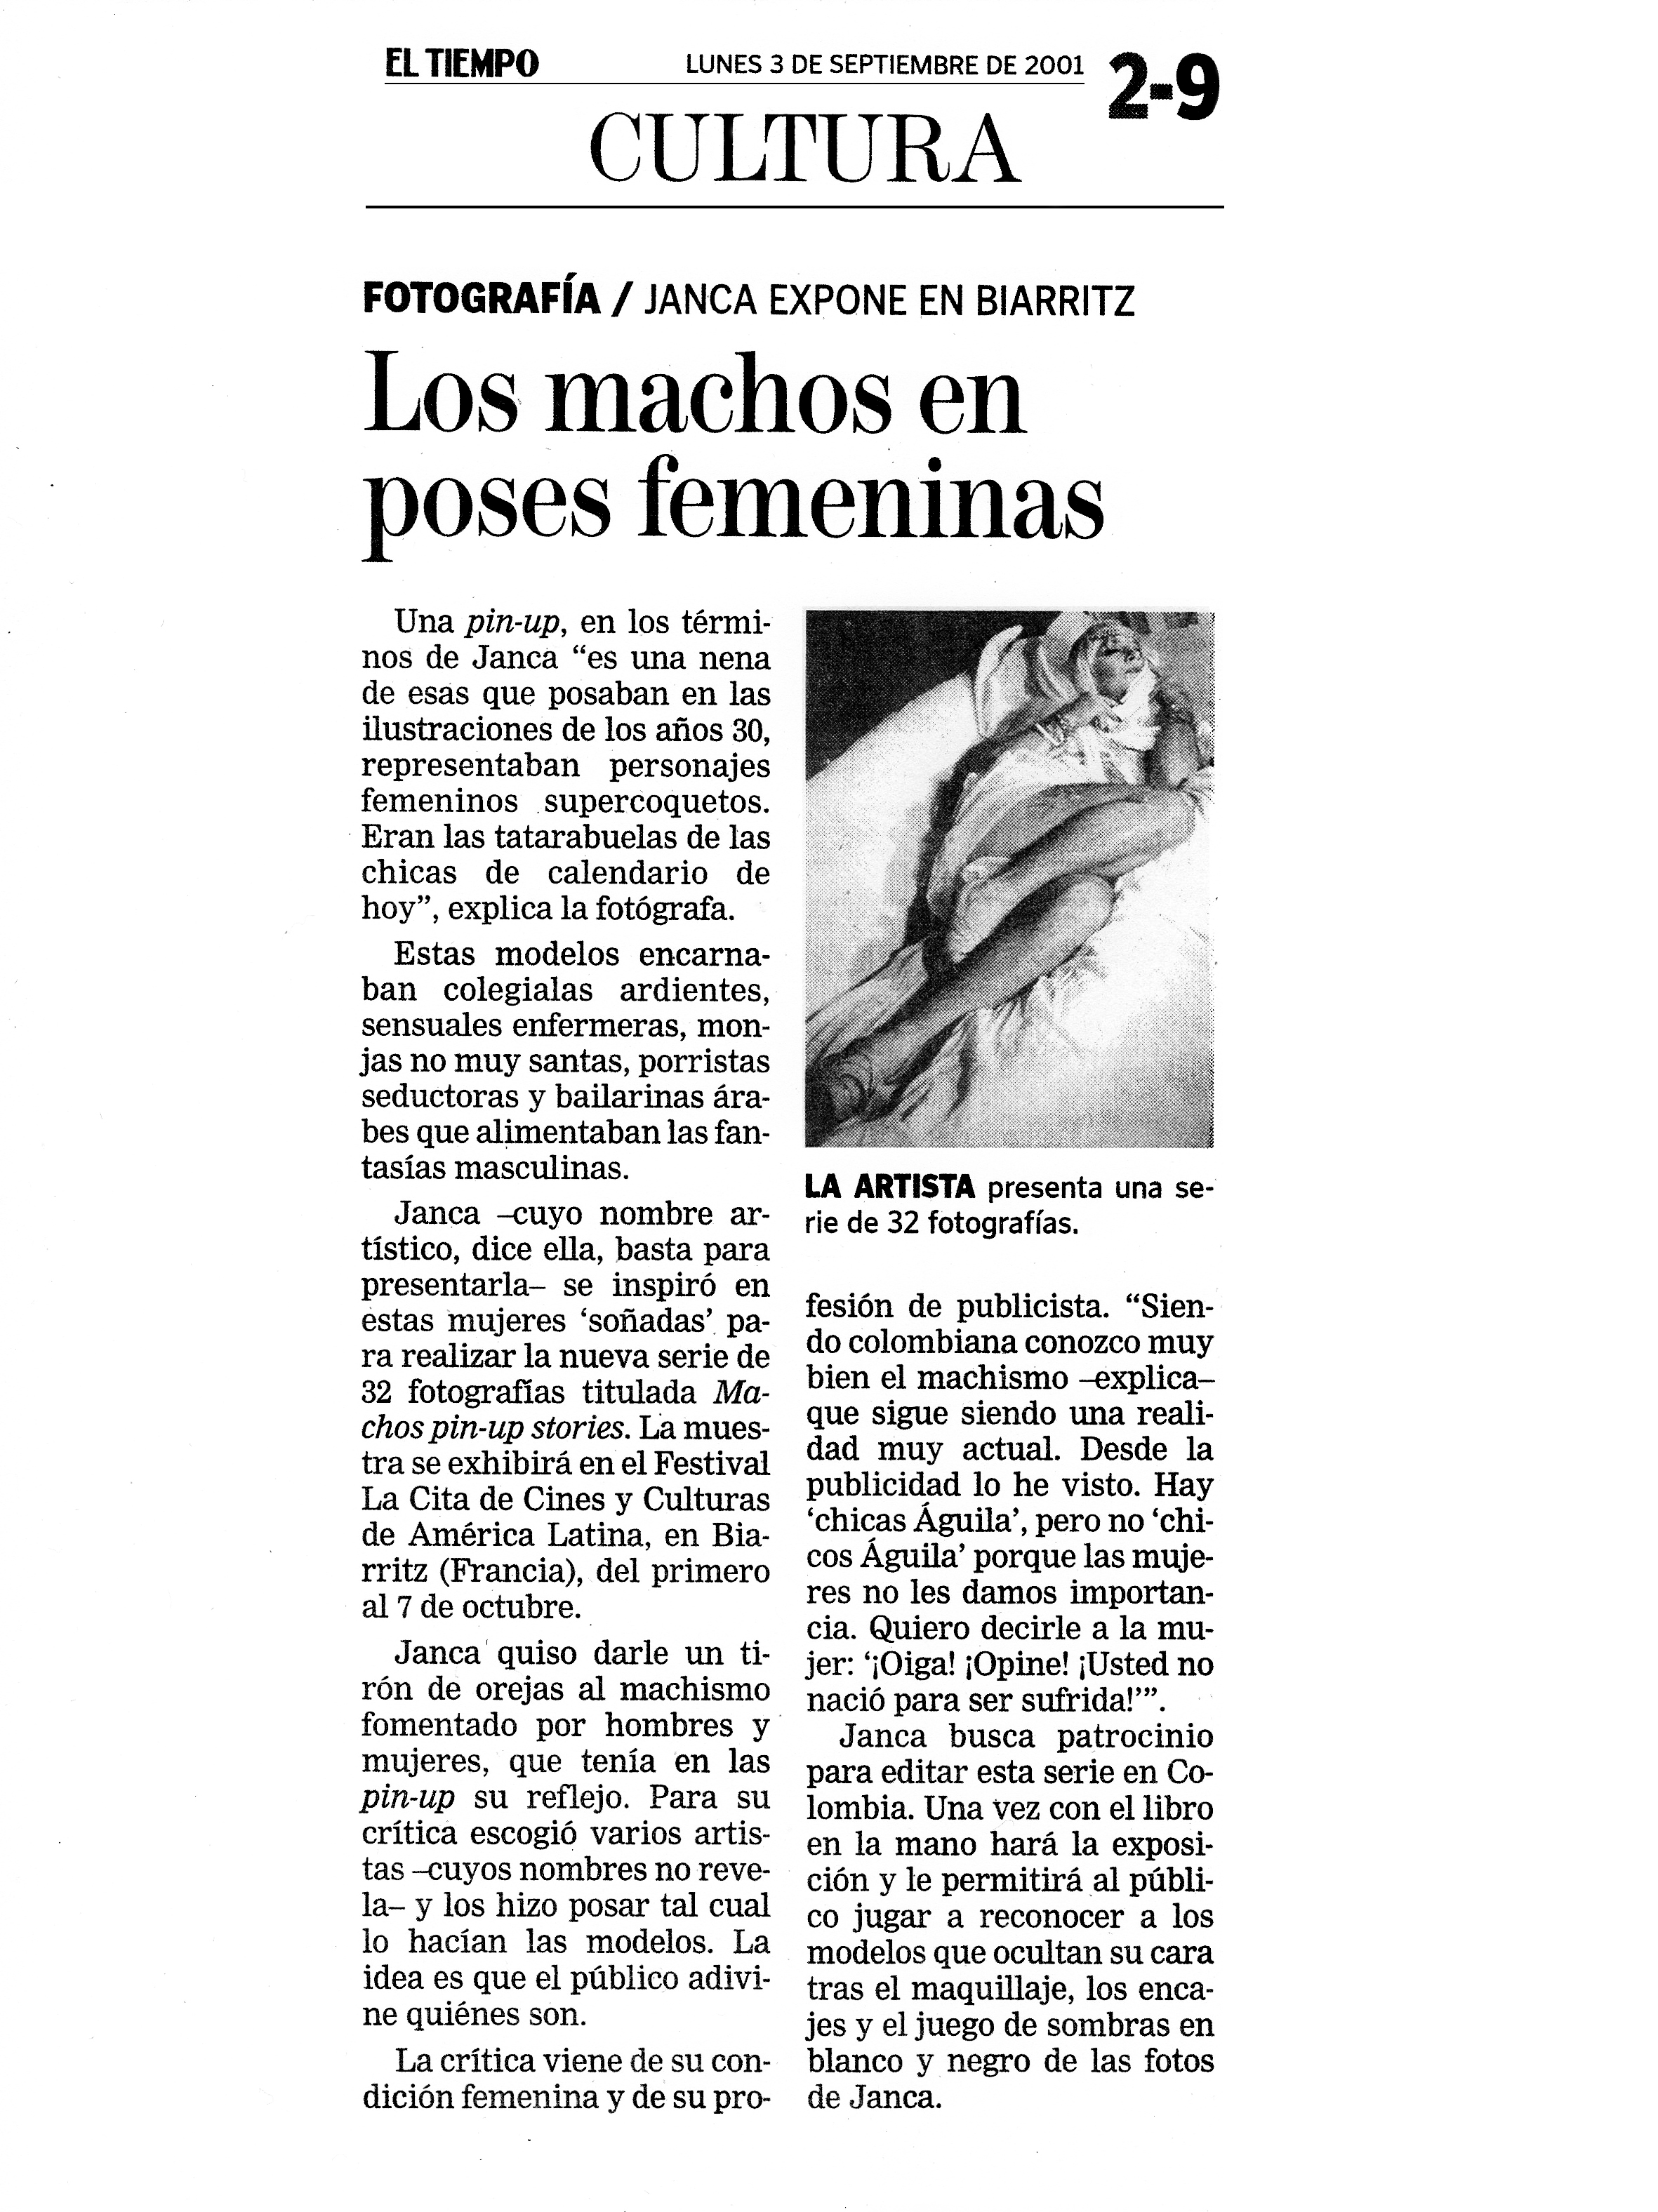 2001 - BGTA - EL TIEMPO  SEPT.jpg